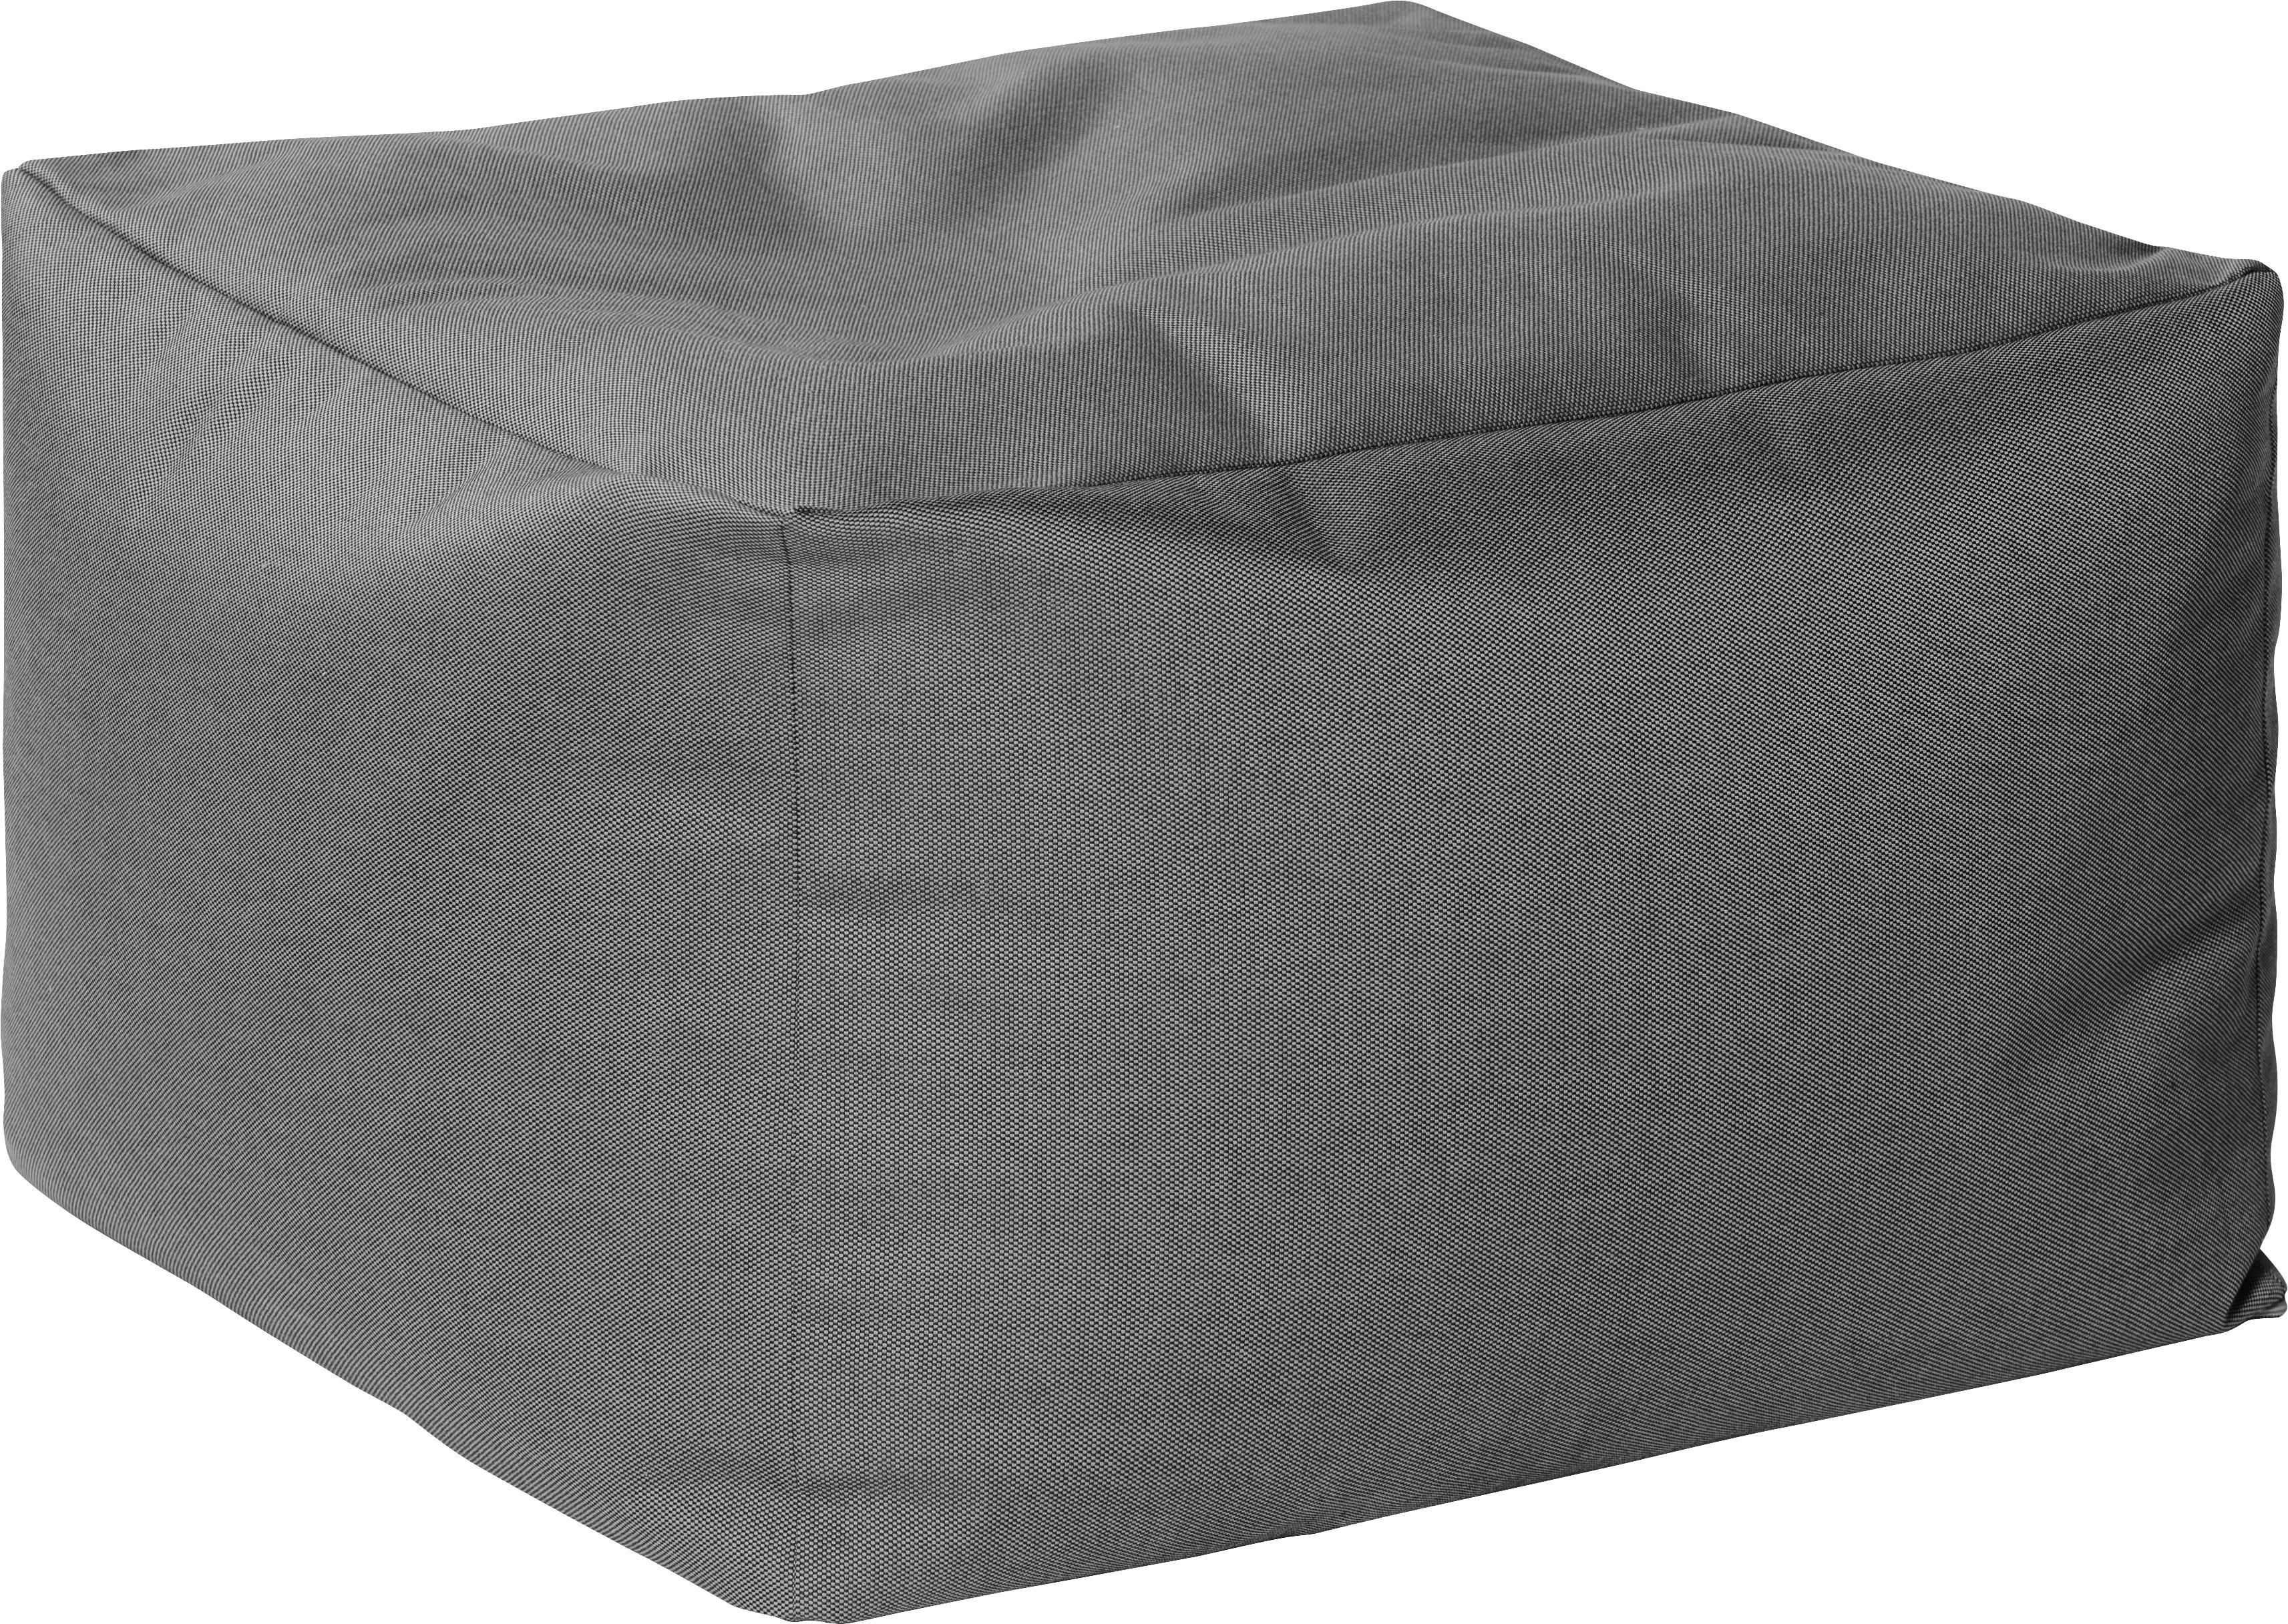 In- & Outdoor Sitzsack Loft, Bezug: 100% Polyacryl Dralon (ga, Anthrazit, B 60 x T 60 cm